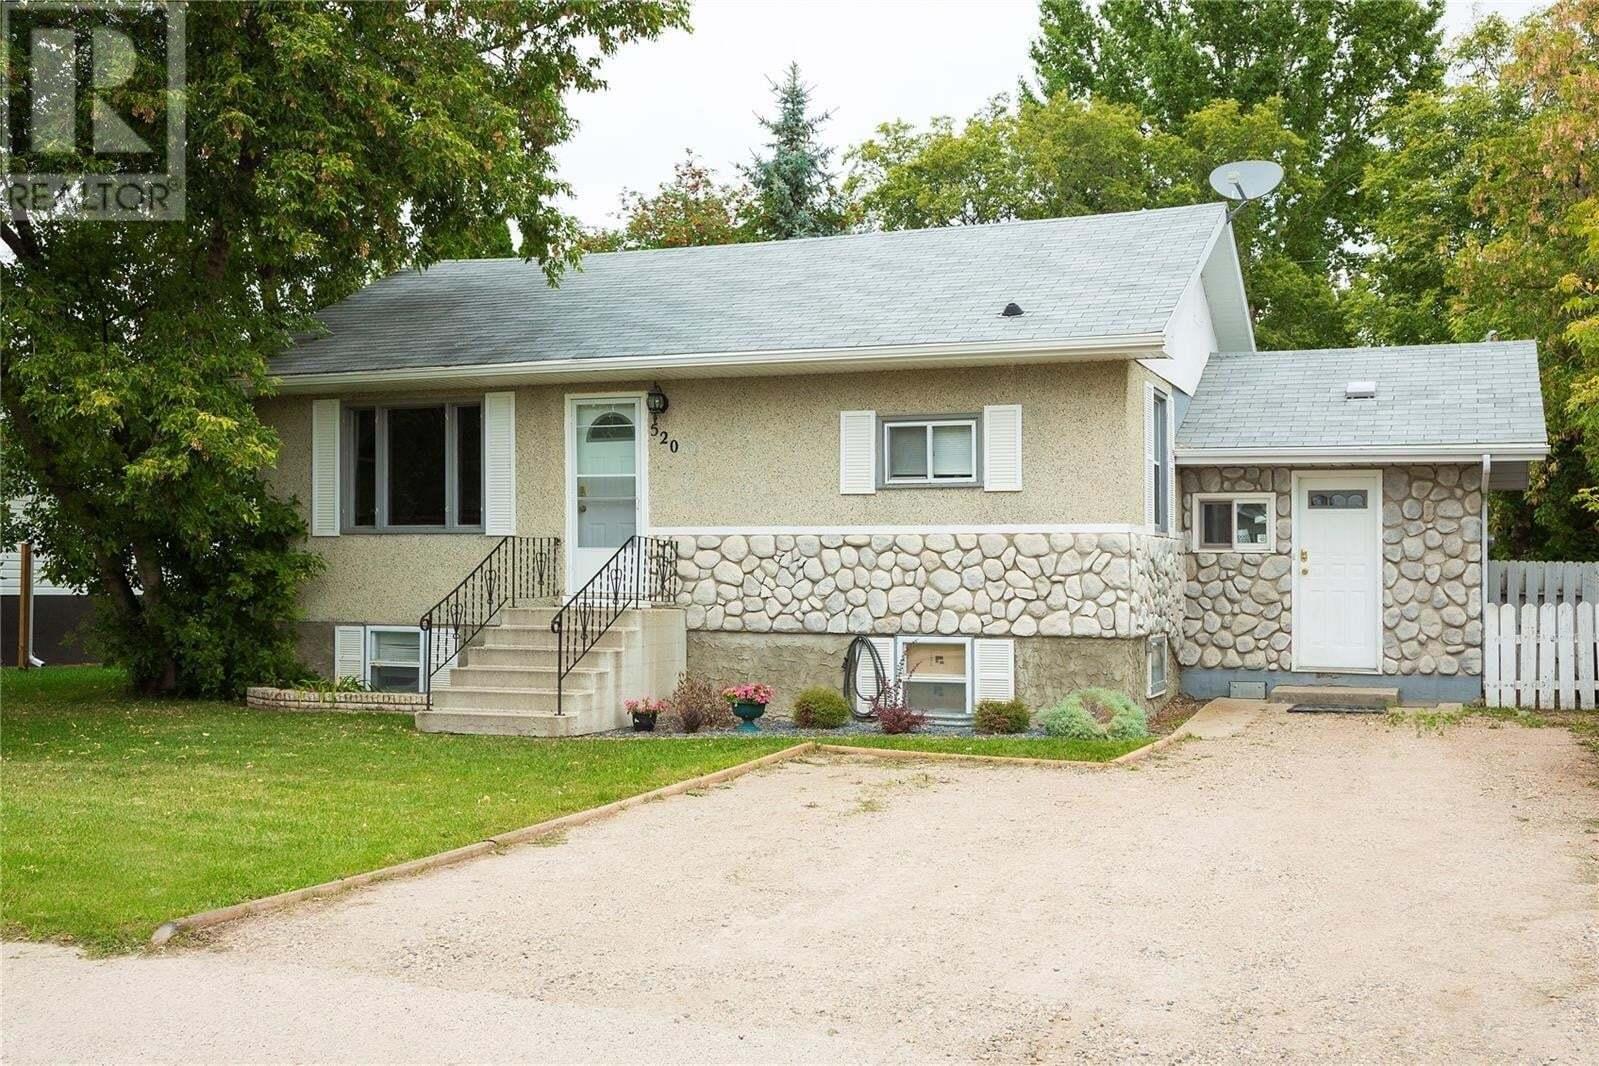 House for sale at 520 26th St E Prince Albert Saskatchewan - MLS: SK827474